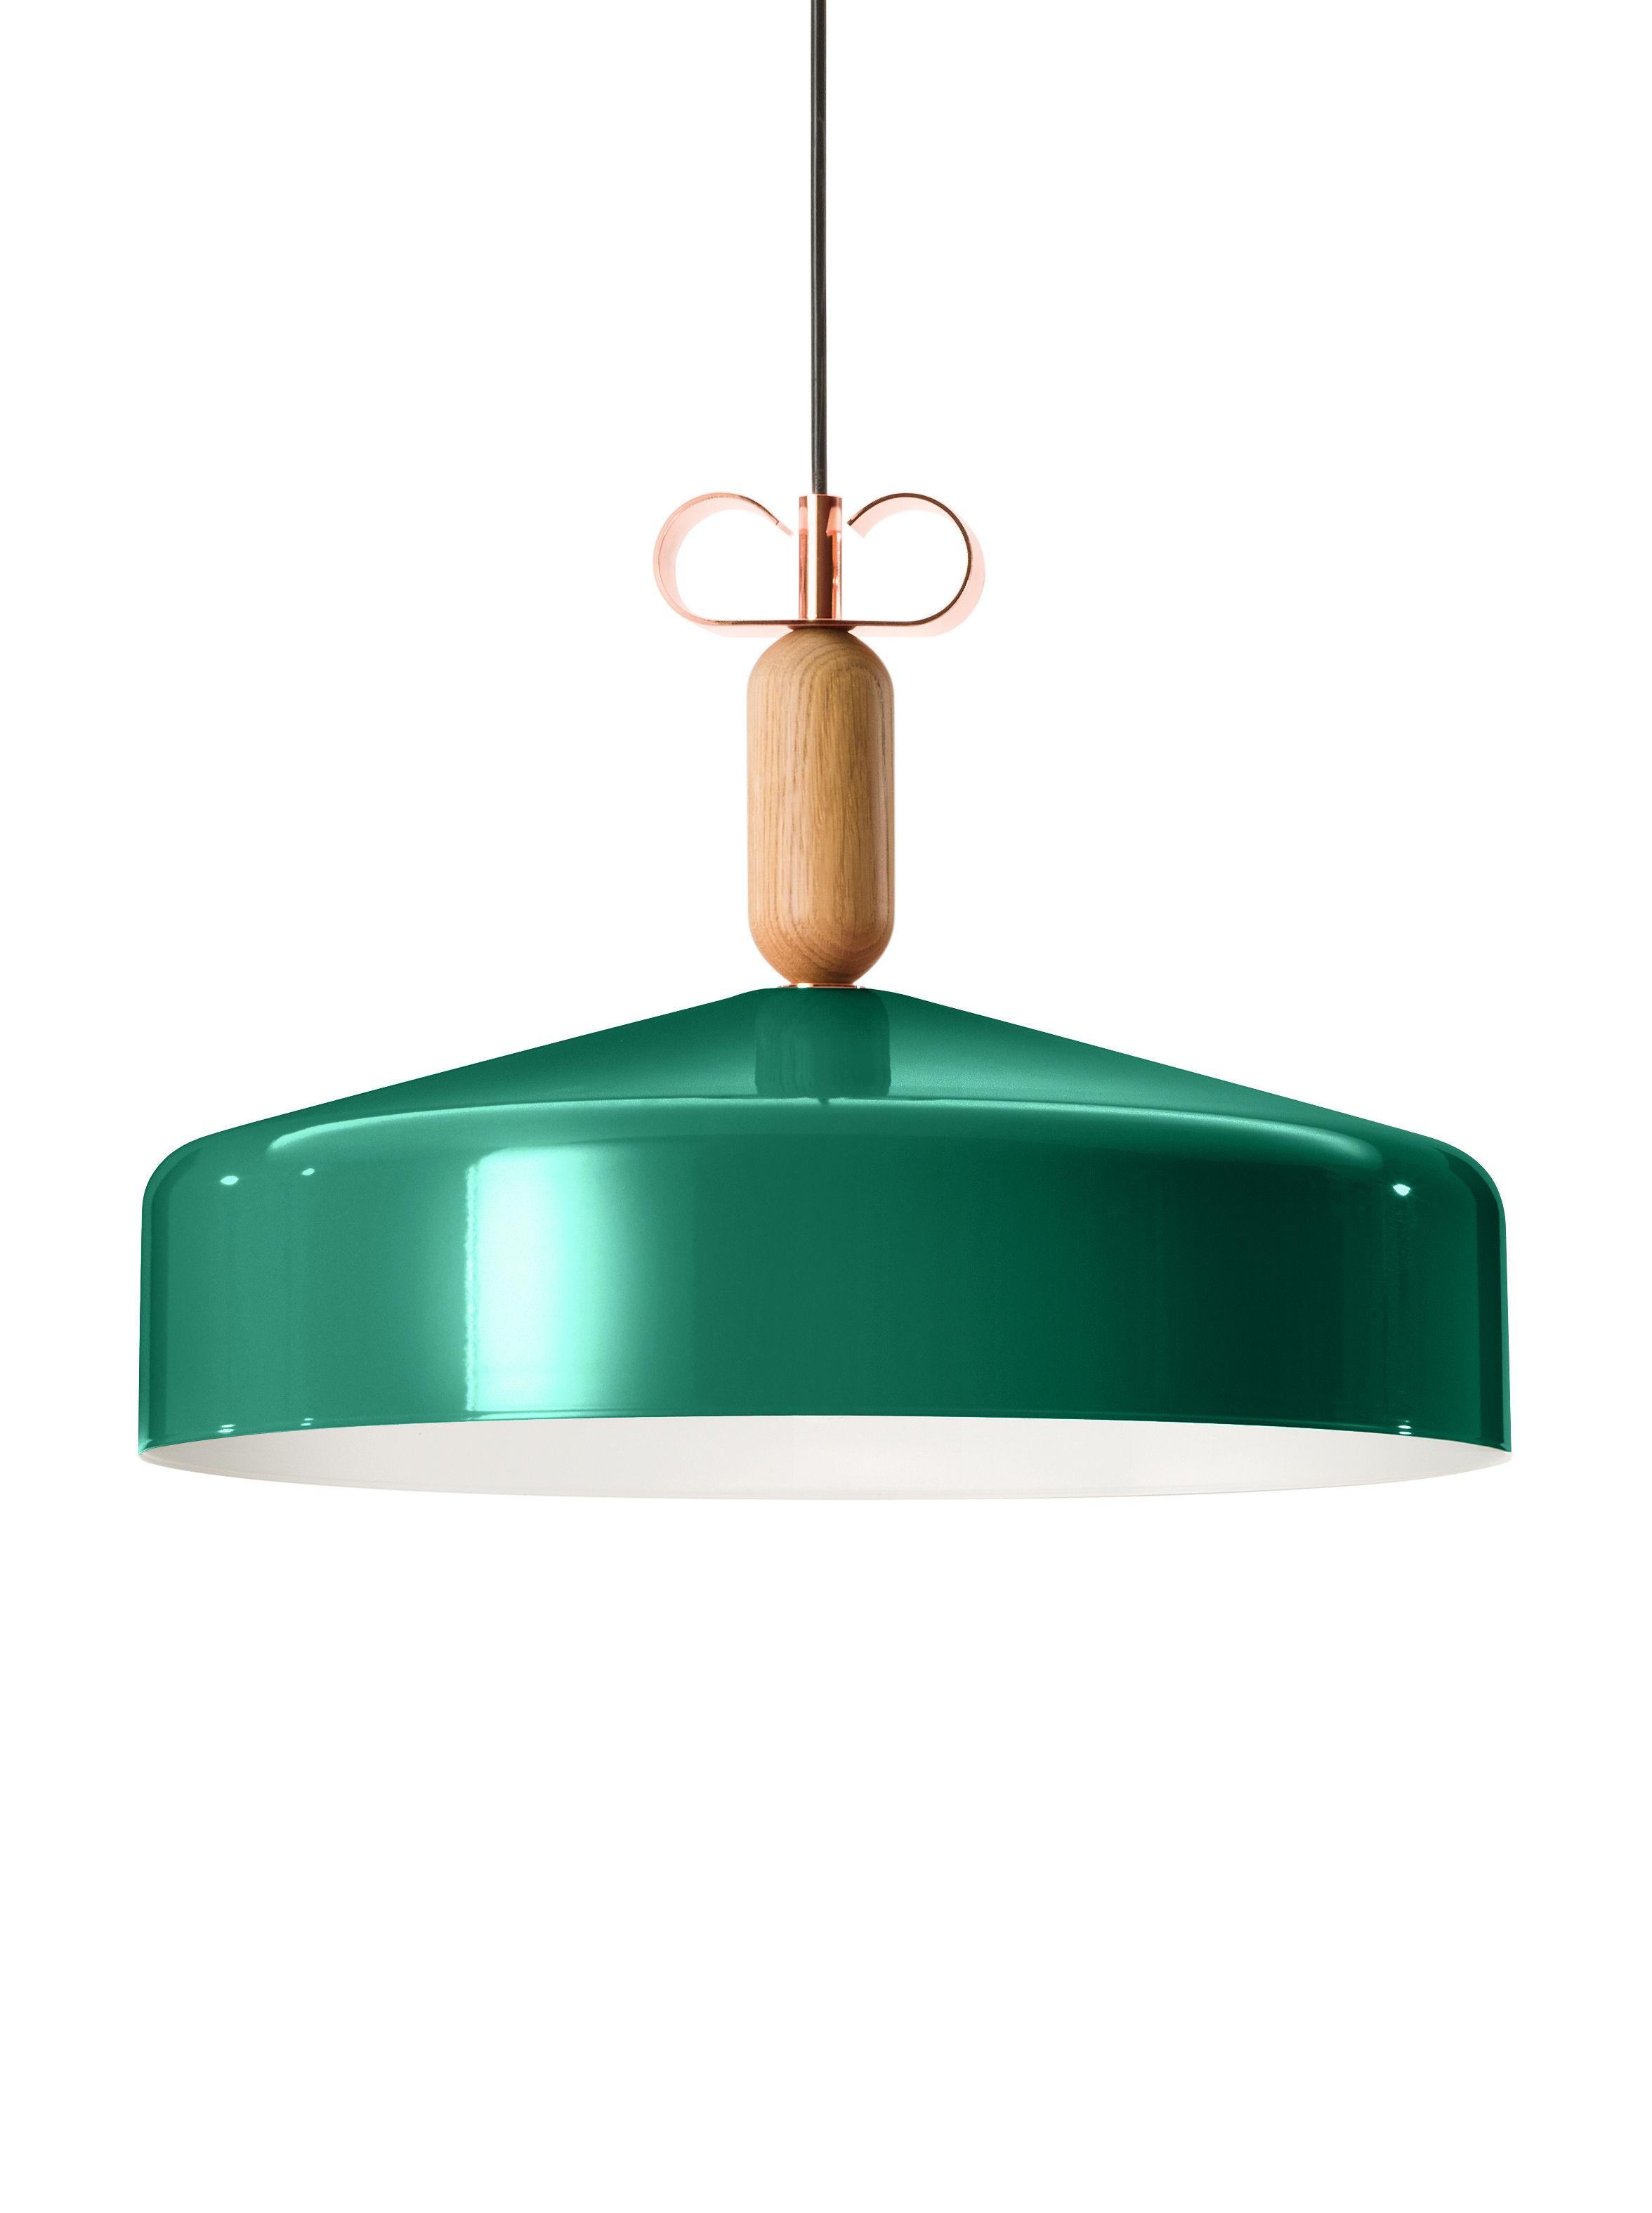 Lighting - Pendant Lighting - Bon Ton Pendant - Ø 45 cm - Exclusivity by Torremato - Glossy green / White - Oak, Varnished aluminium